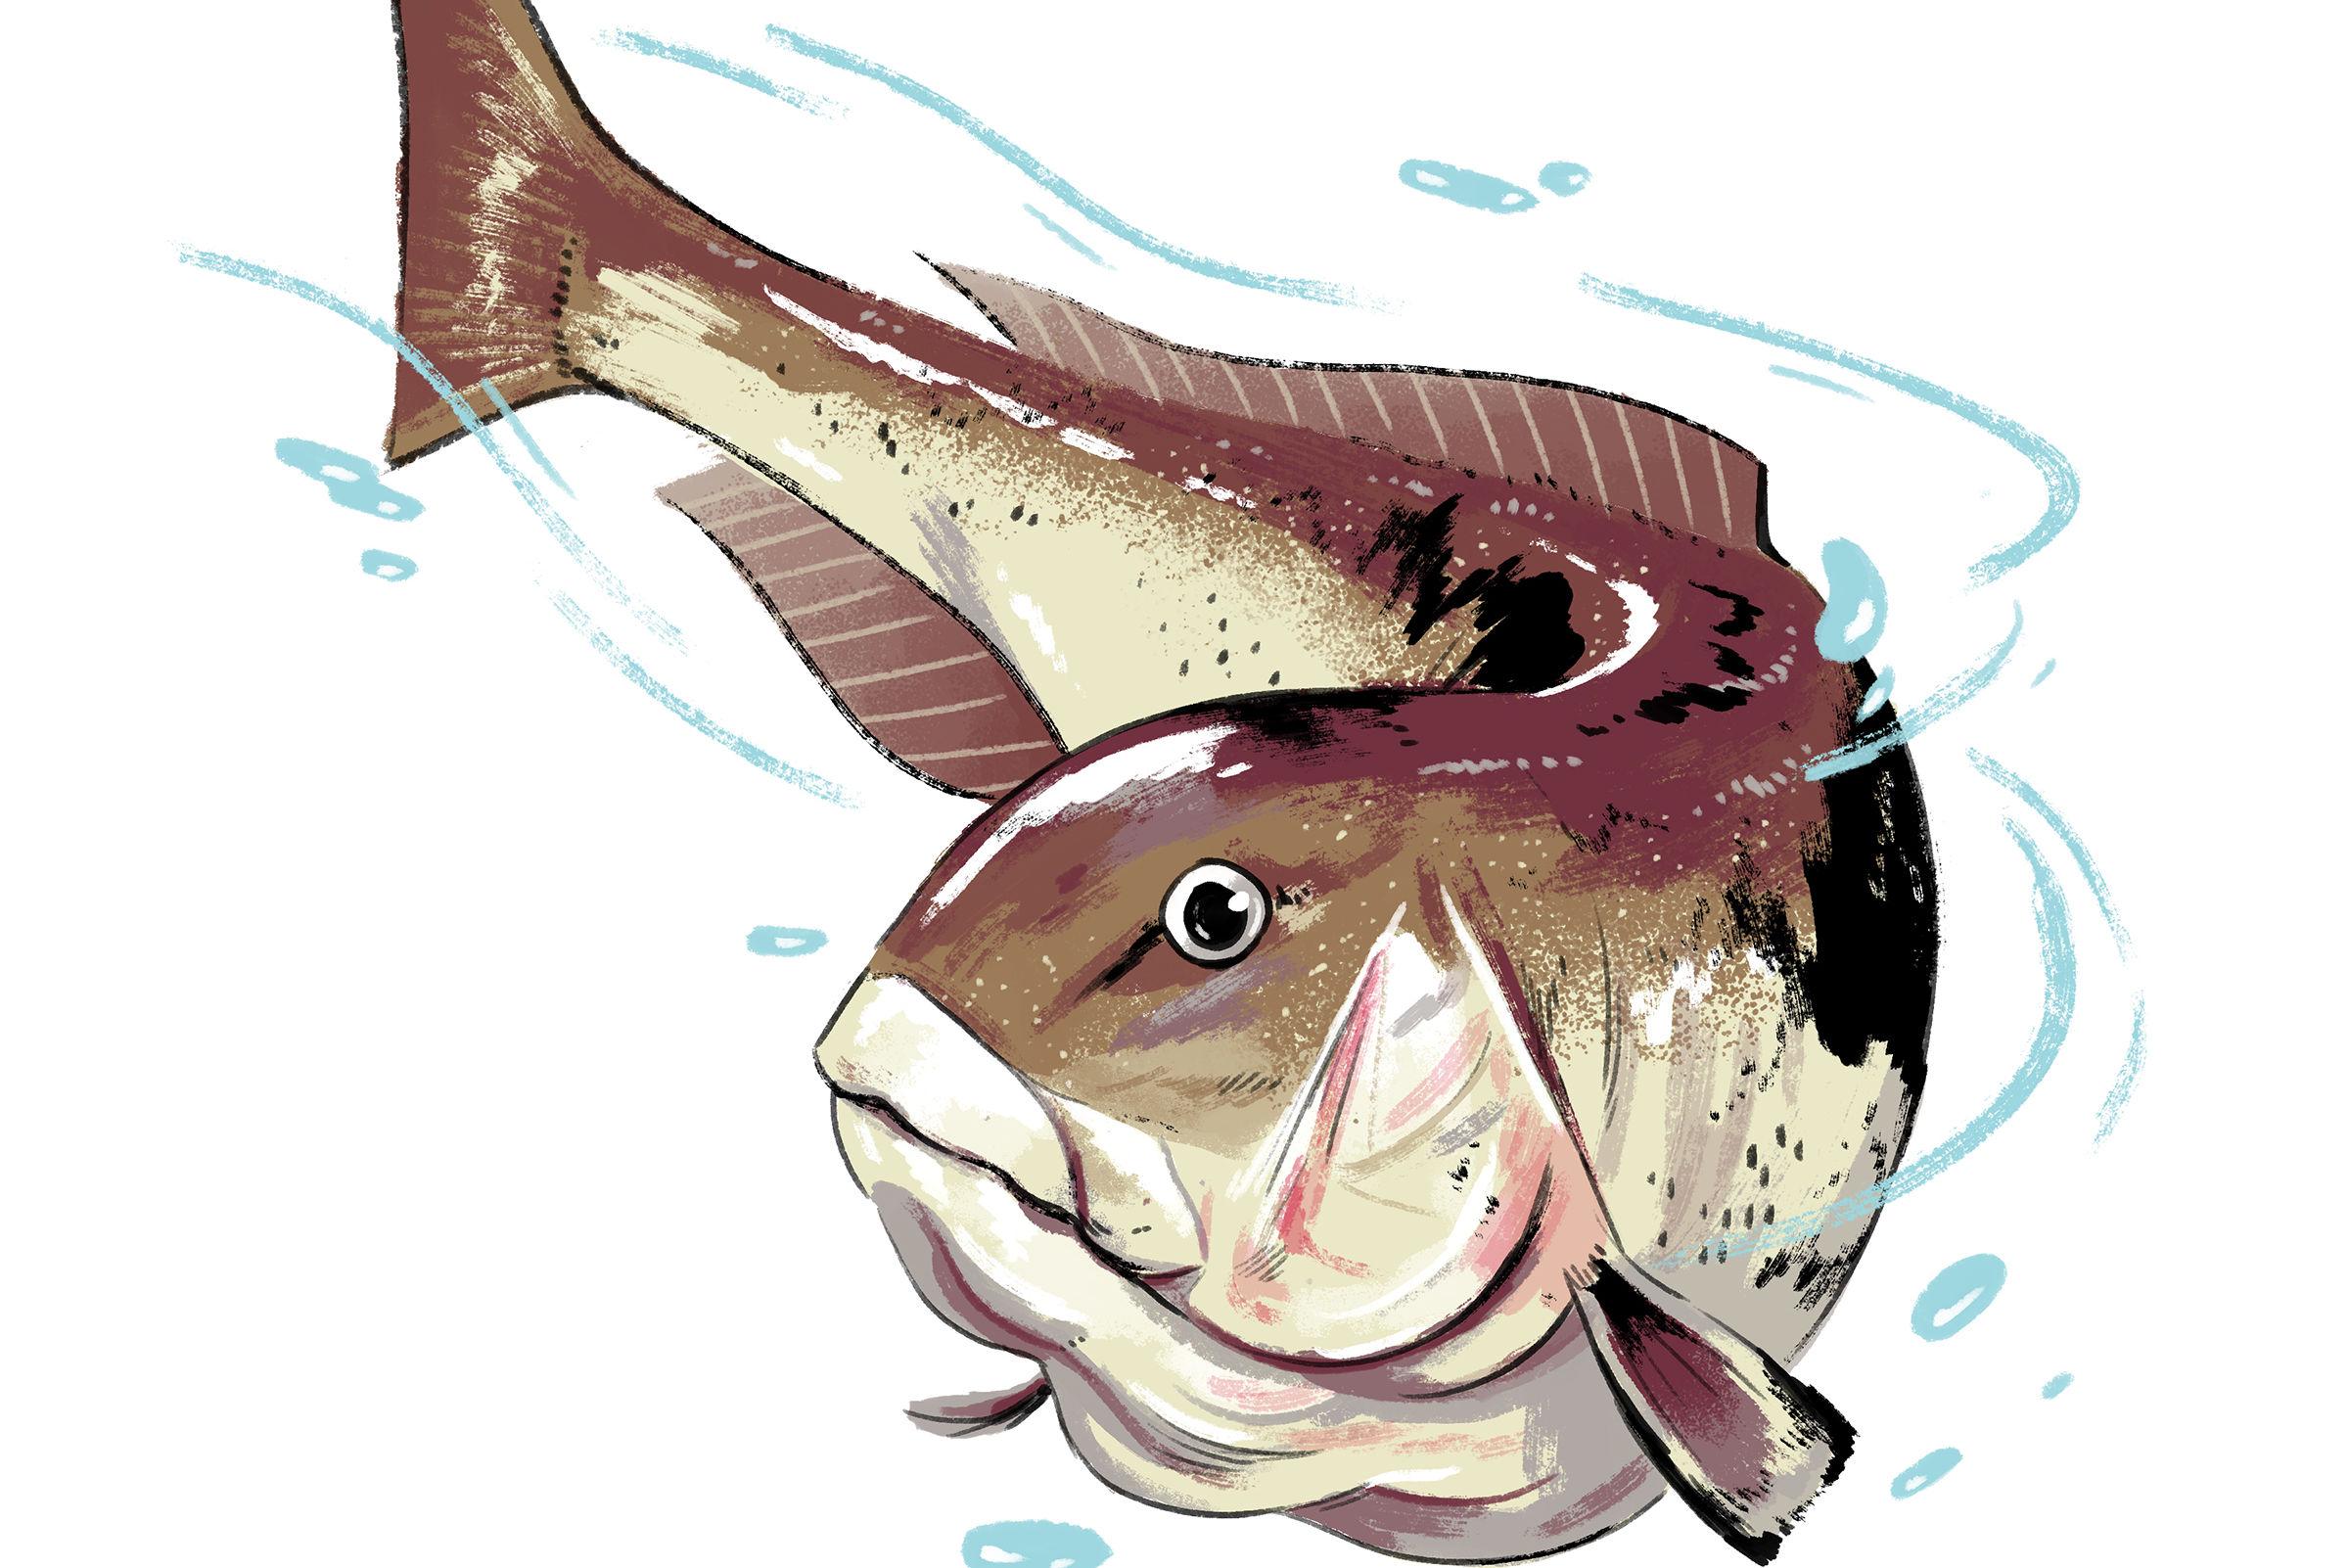 Kf houstonia fish spots   tilefish mbdgjt